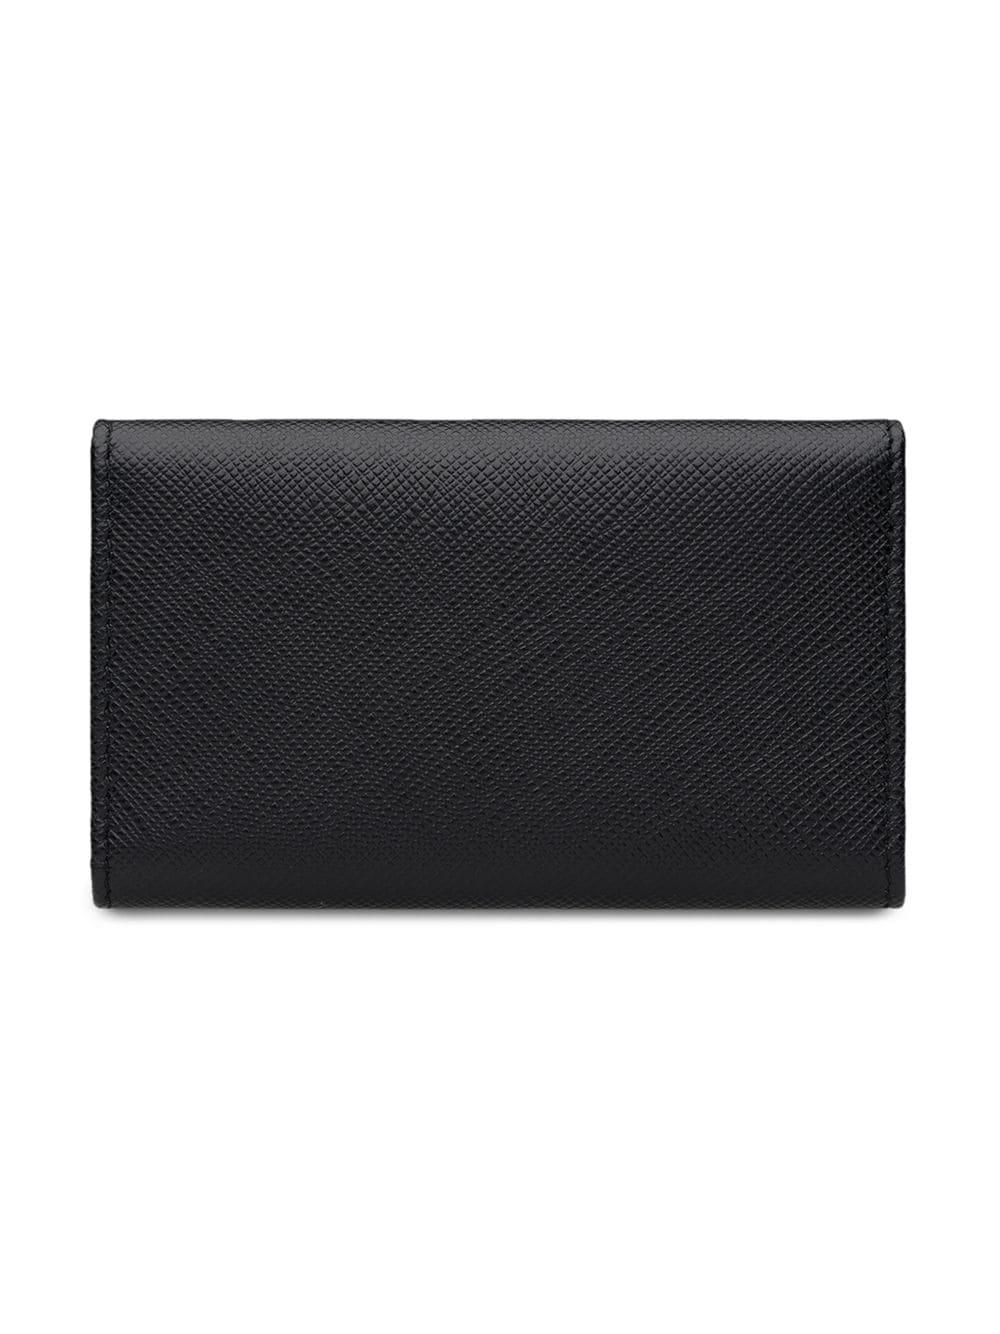 64f8105c507 ... discount code for prada black keyholder wallet for men lyst. view  fullscreen 3b323 17c8c